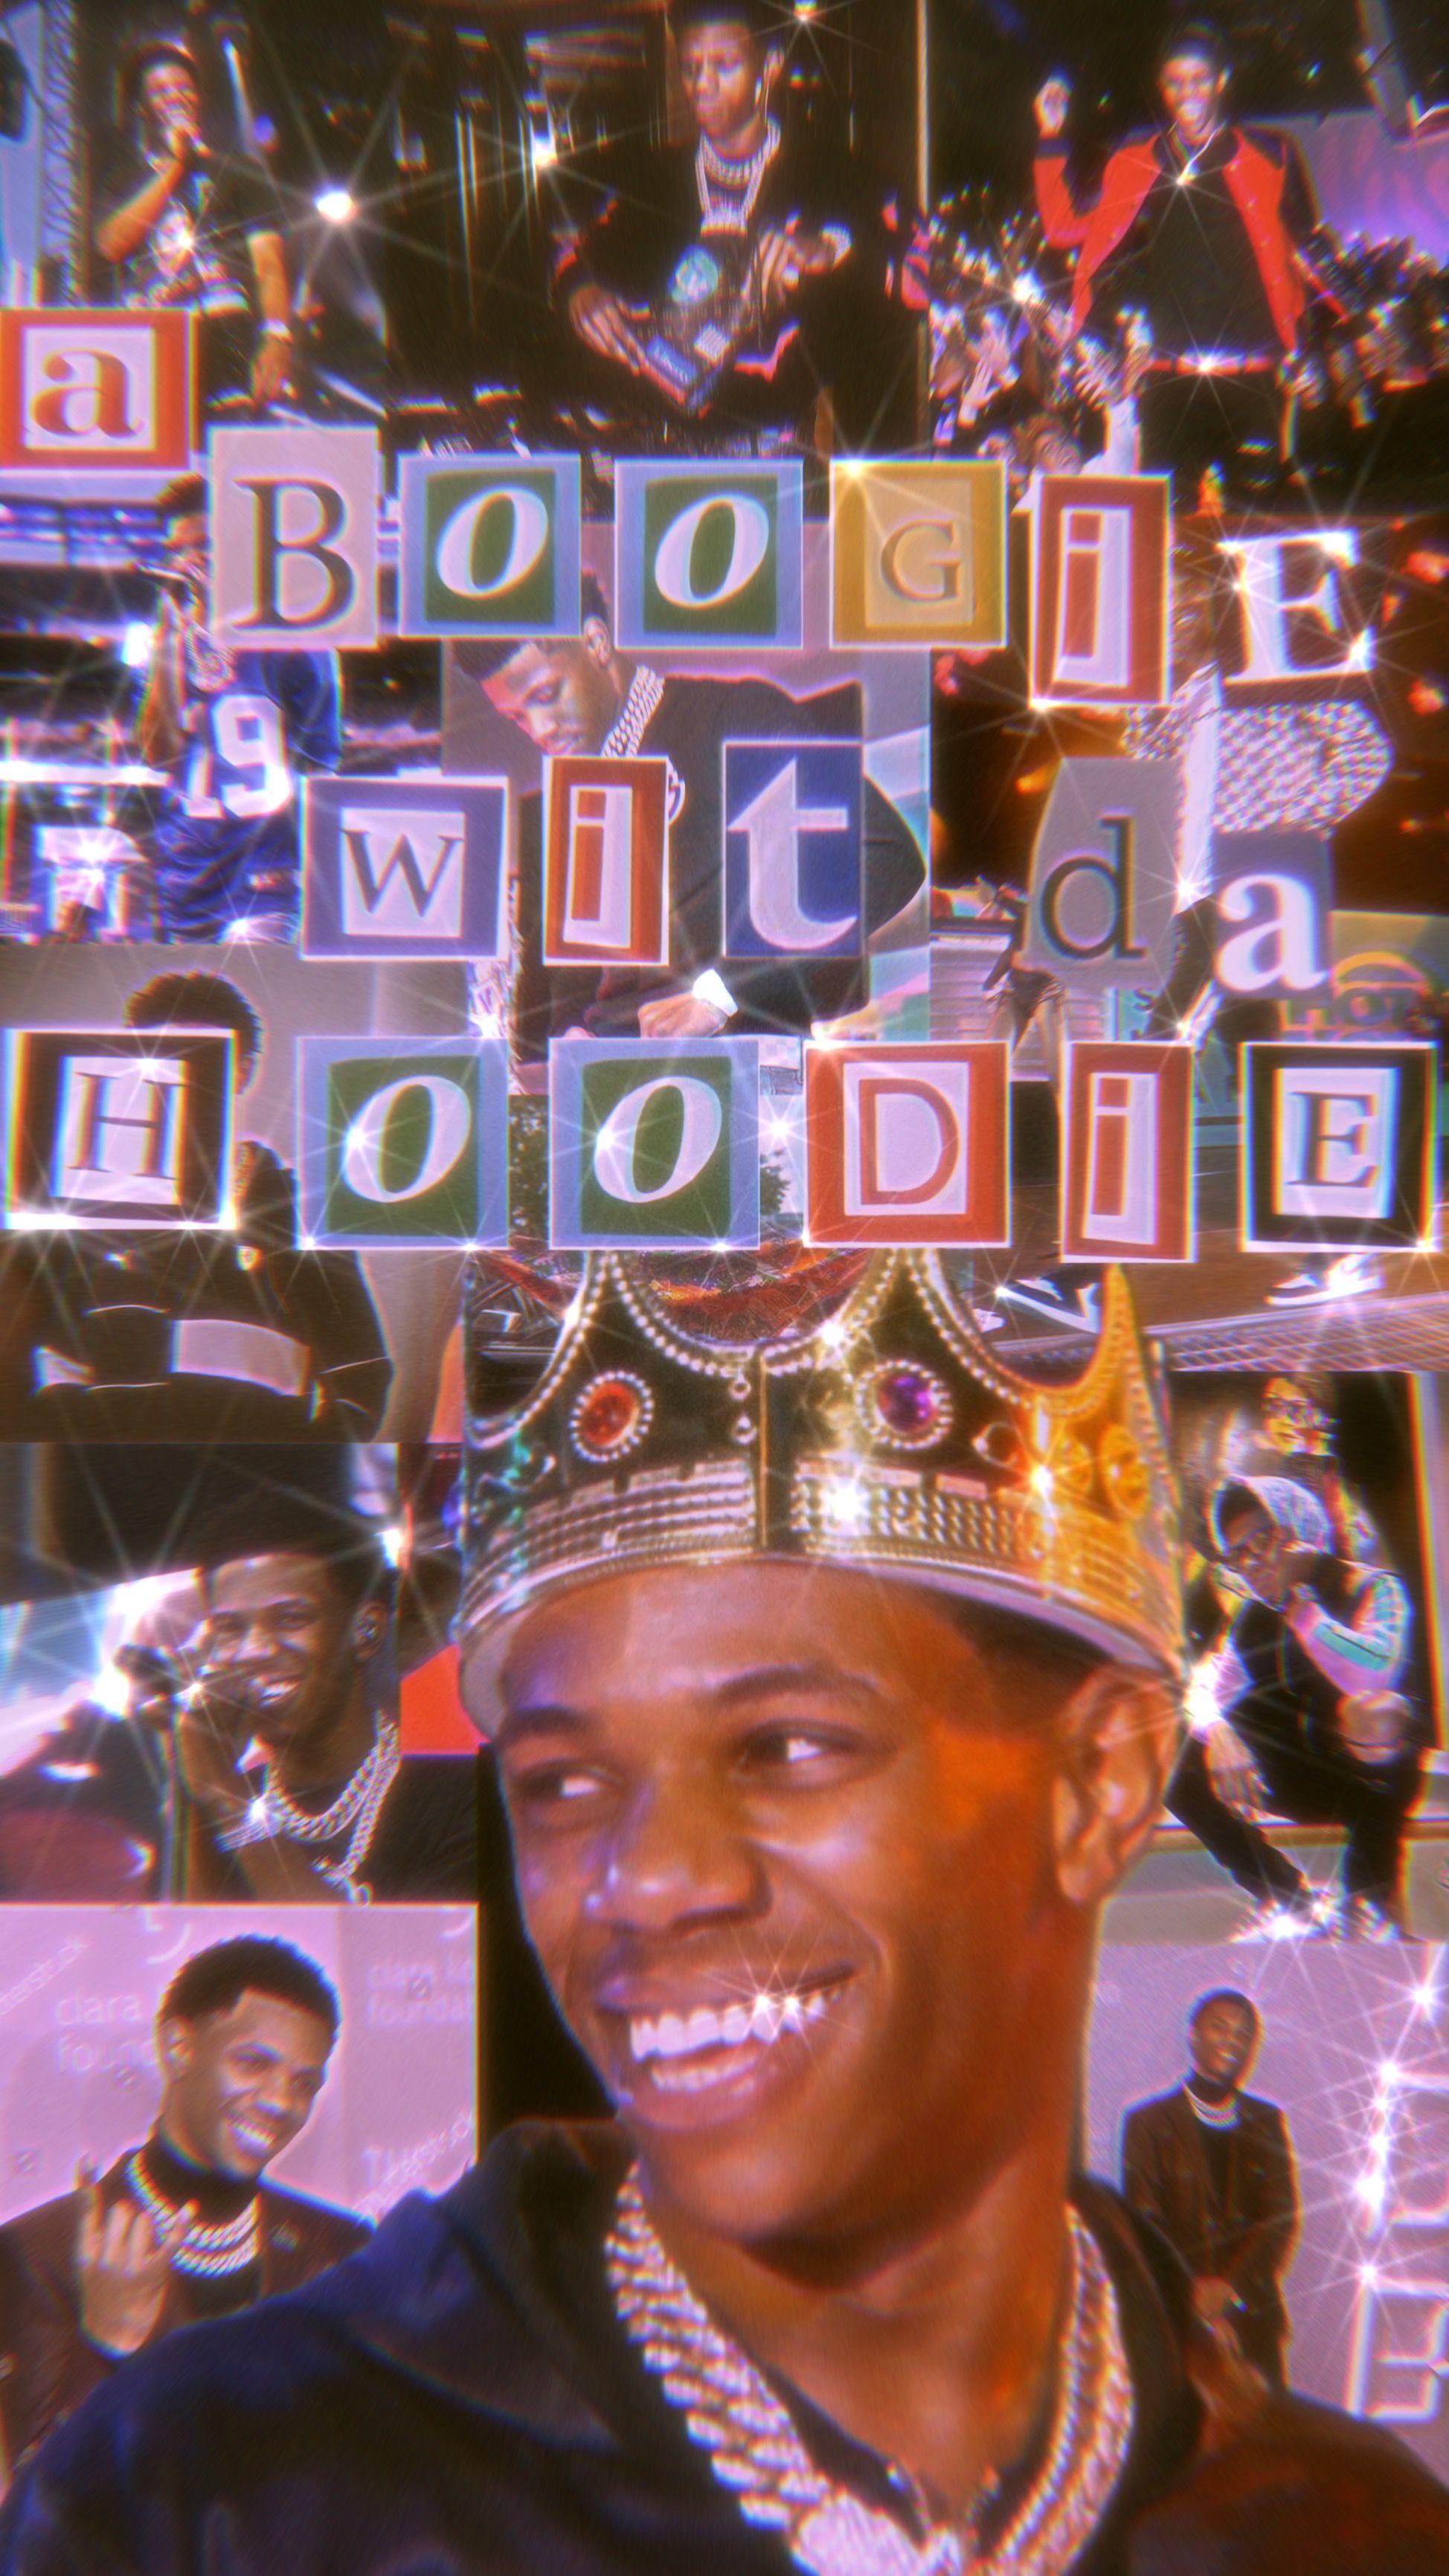 A Boogie Wit Da Hoodie Rapper Wallpaper Iphone Rap Wallpaper Iphone Wallpaper Tumblr Aesthetic